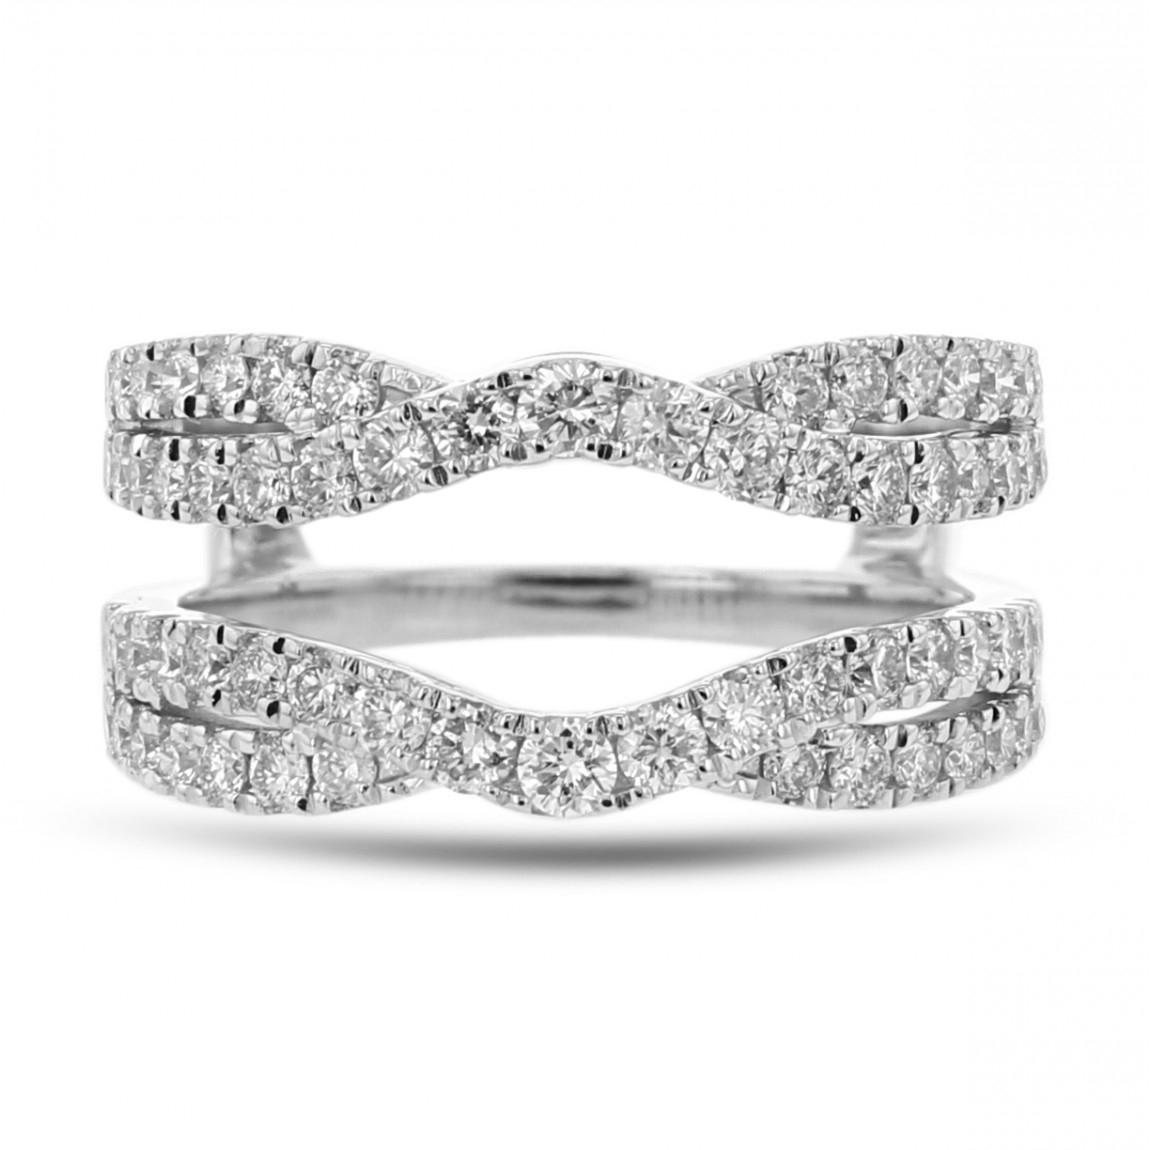 Diamond Cradle Wedding Band, Ring Enhancer, Split Shoulder, 14K White Gold,   (View 11 of 25)